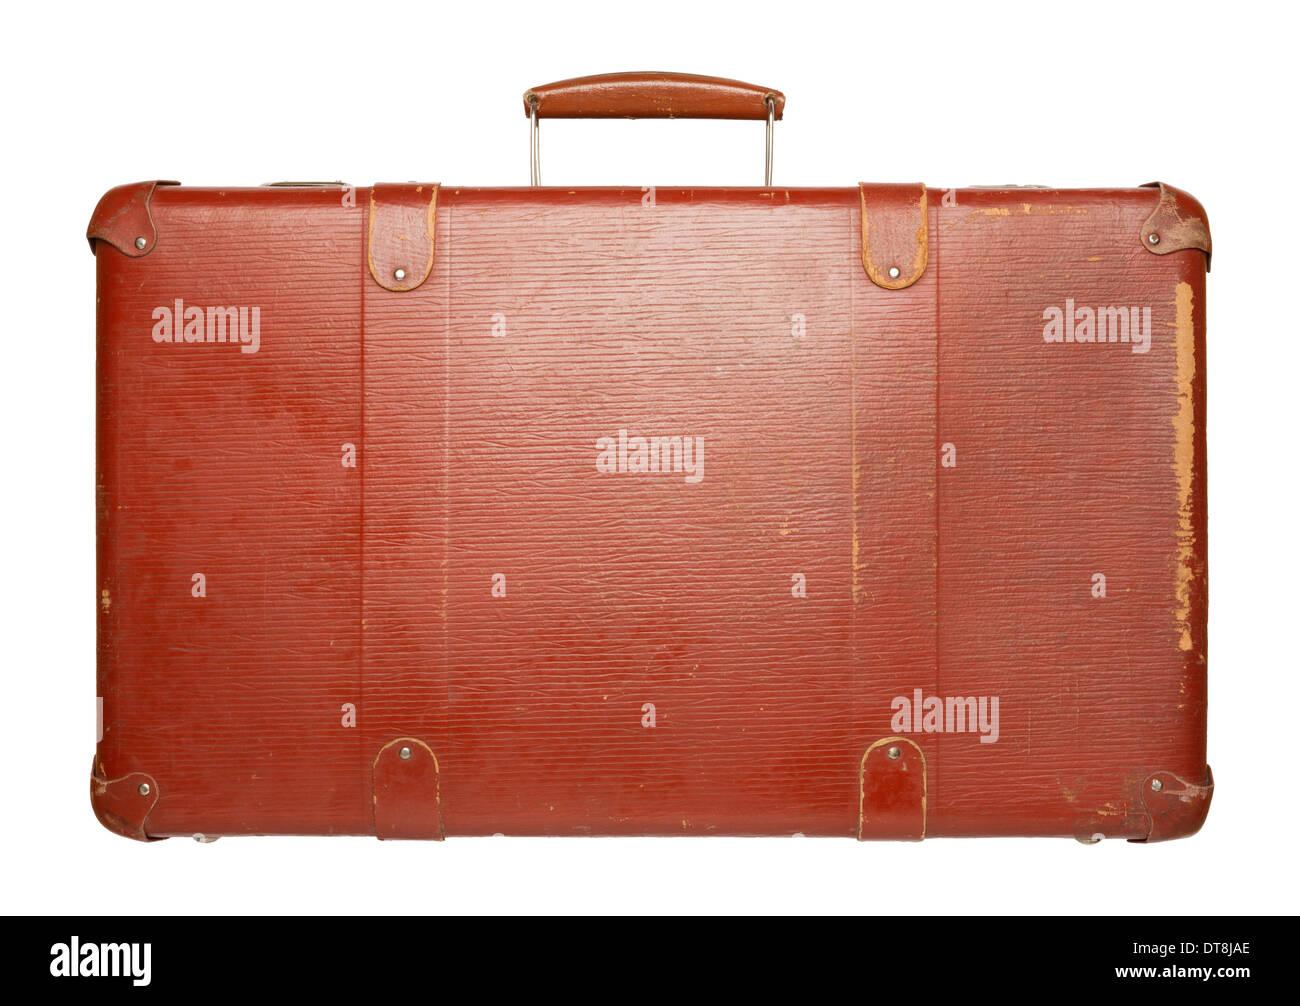 Vintage red suitcase isolated on white background - Stock Image